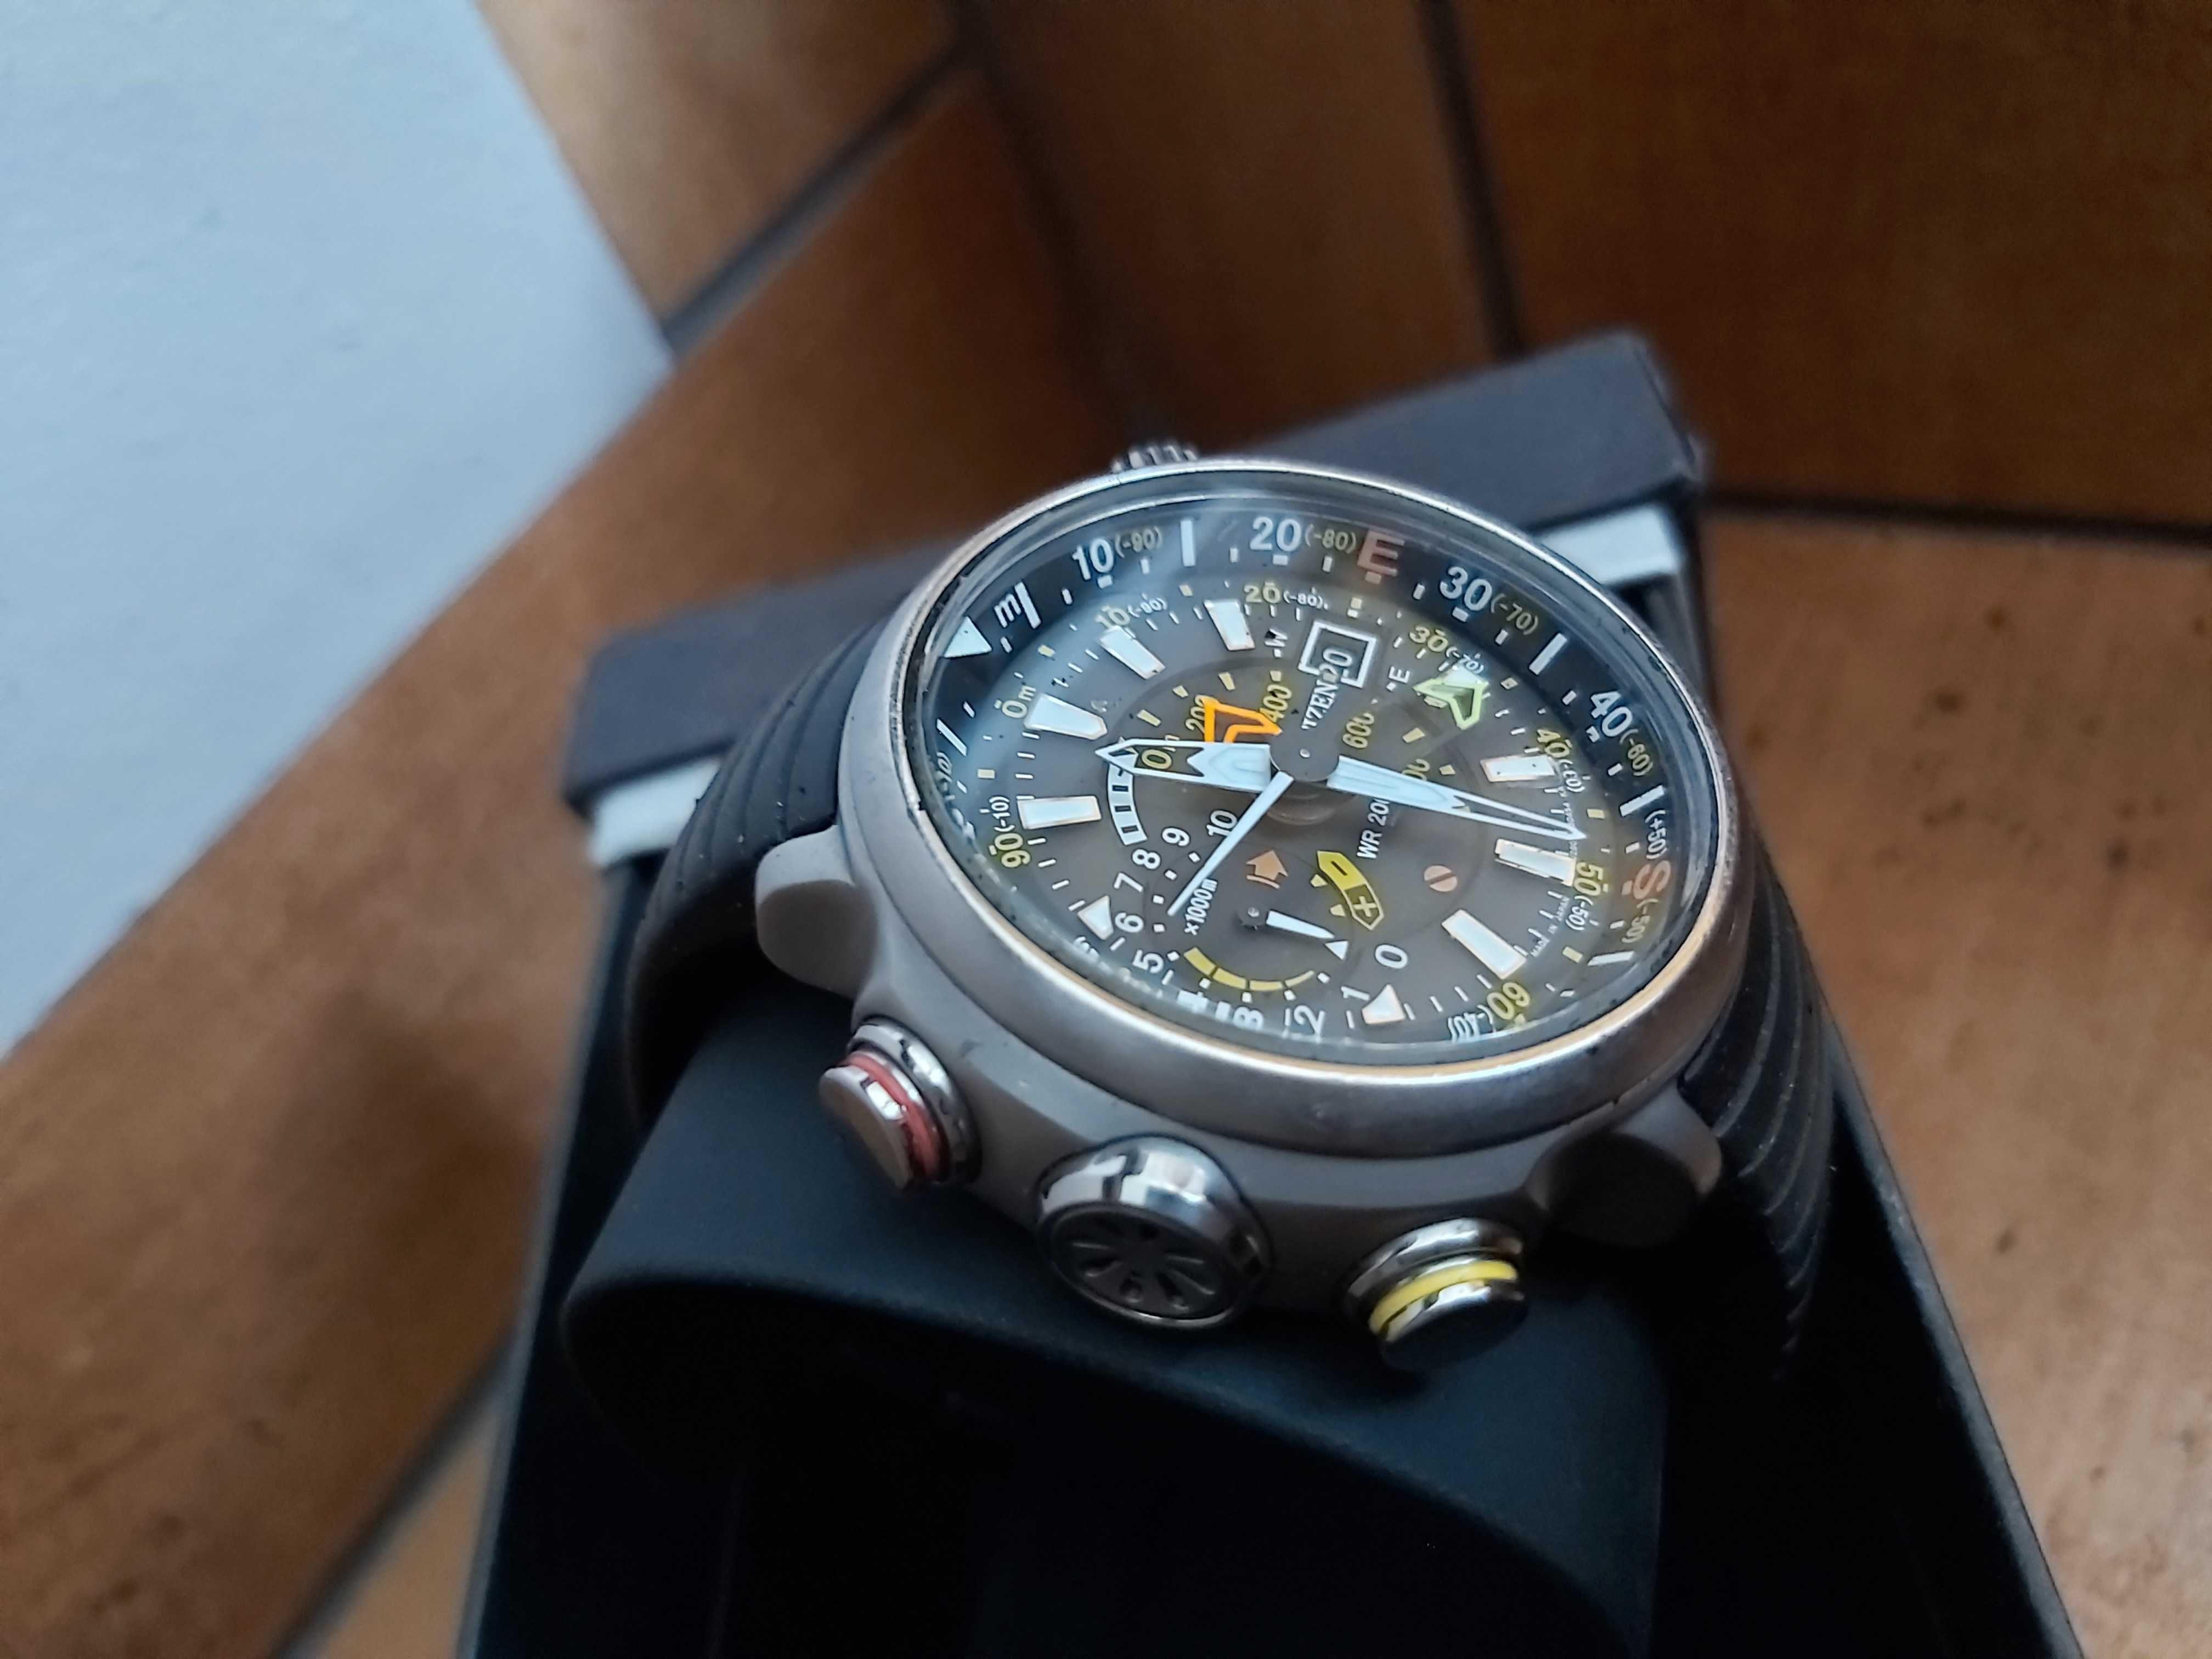 Zegarek Citizen Altichron diver nurek kompas wysokościomierz 200 m.